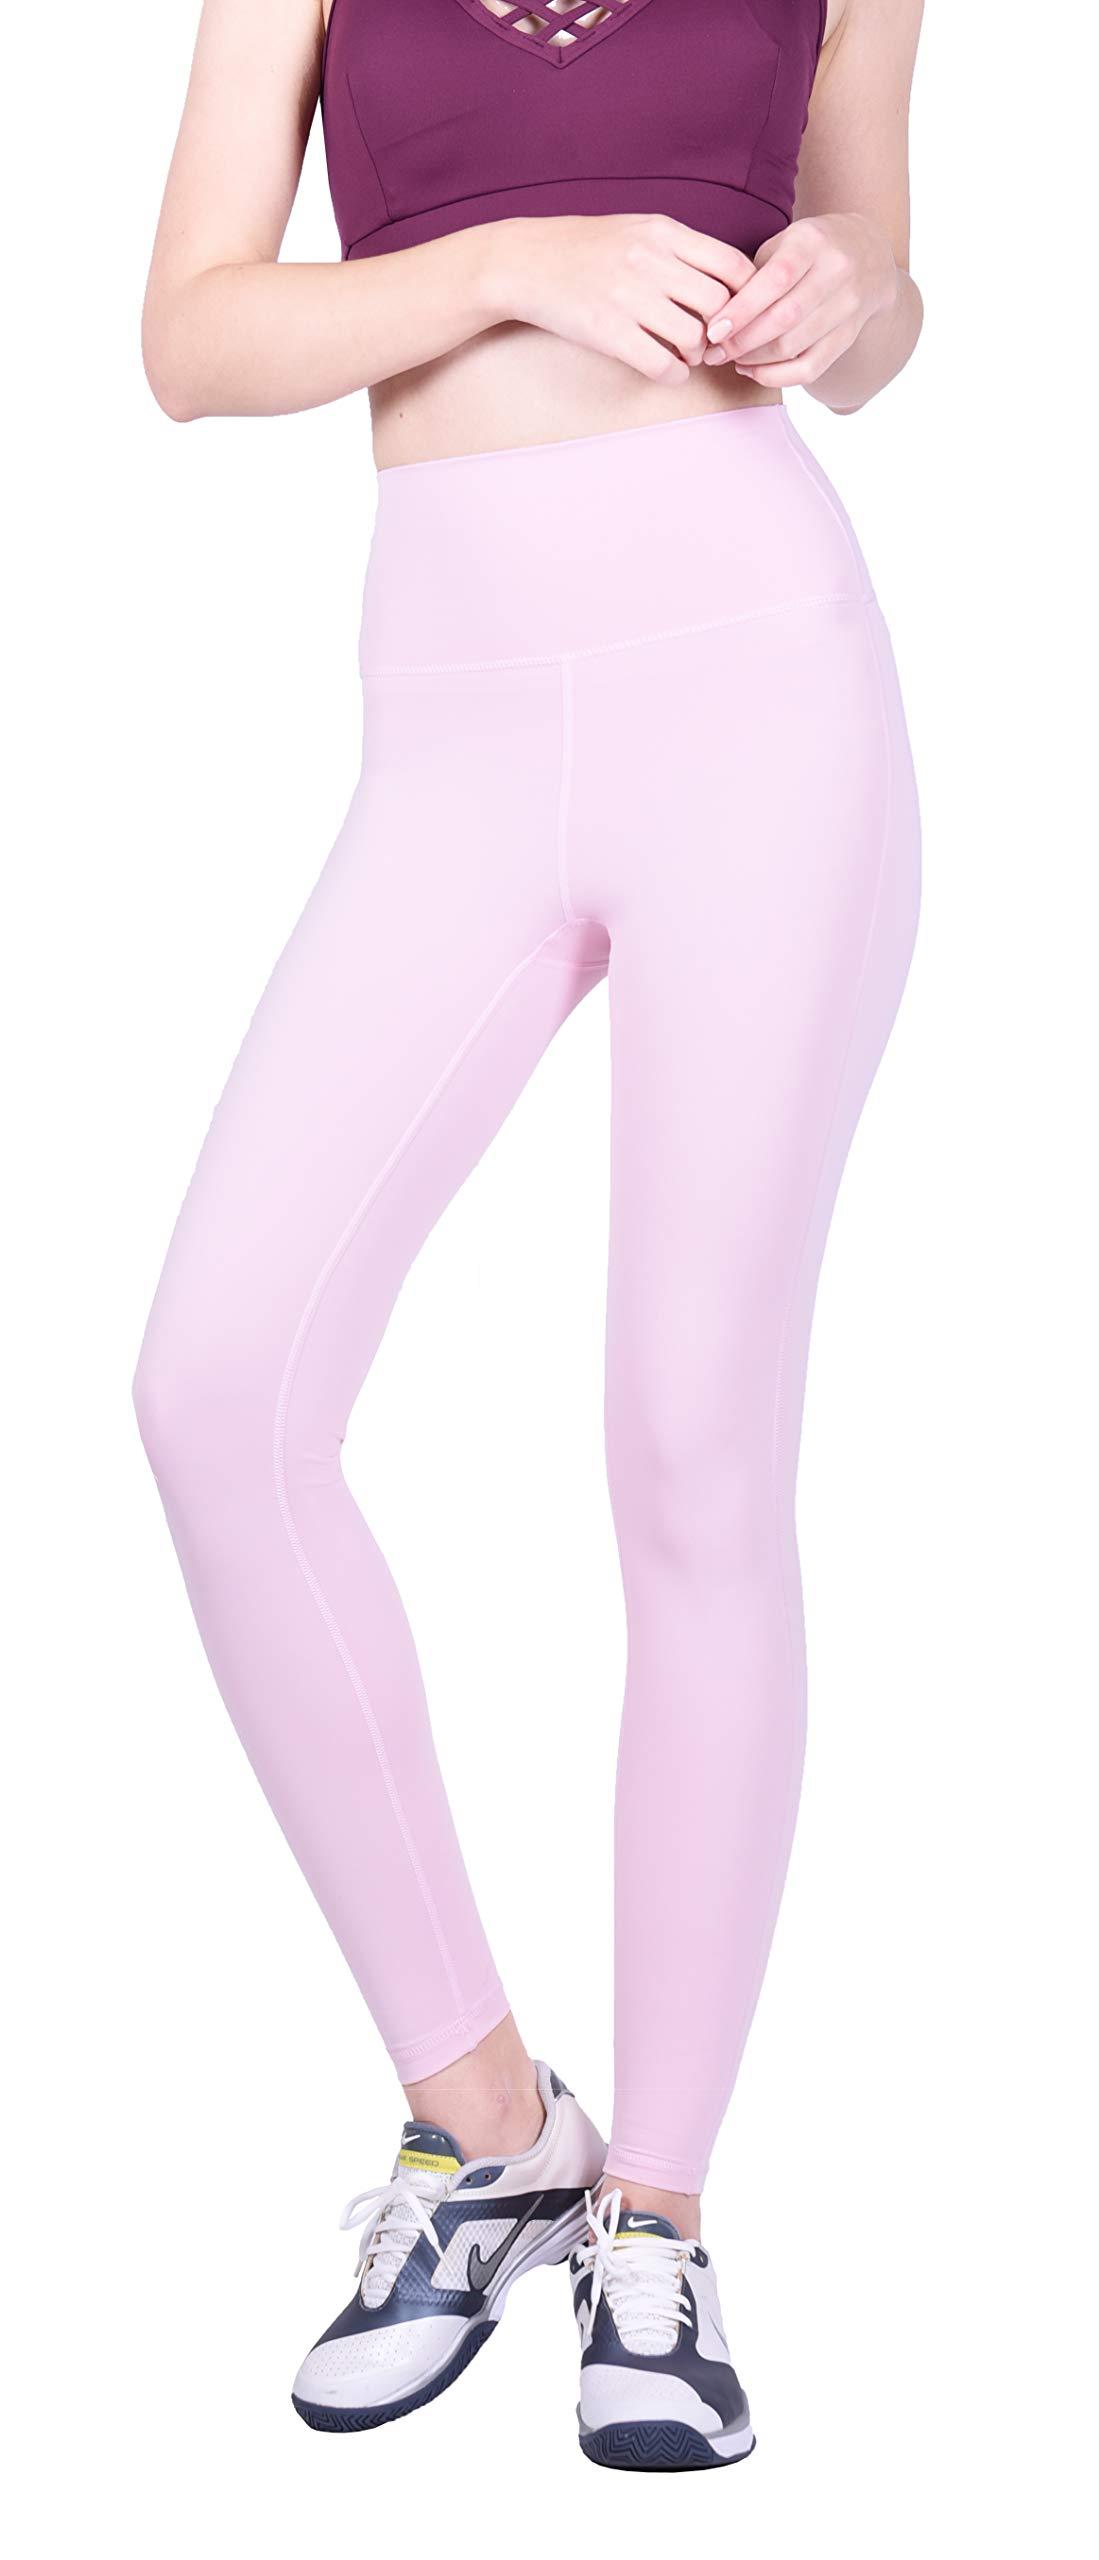 Private Island Women Swim Long Leggings UPF50+ Rash Guard Wetsuit (S, Pink) by Private Island